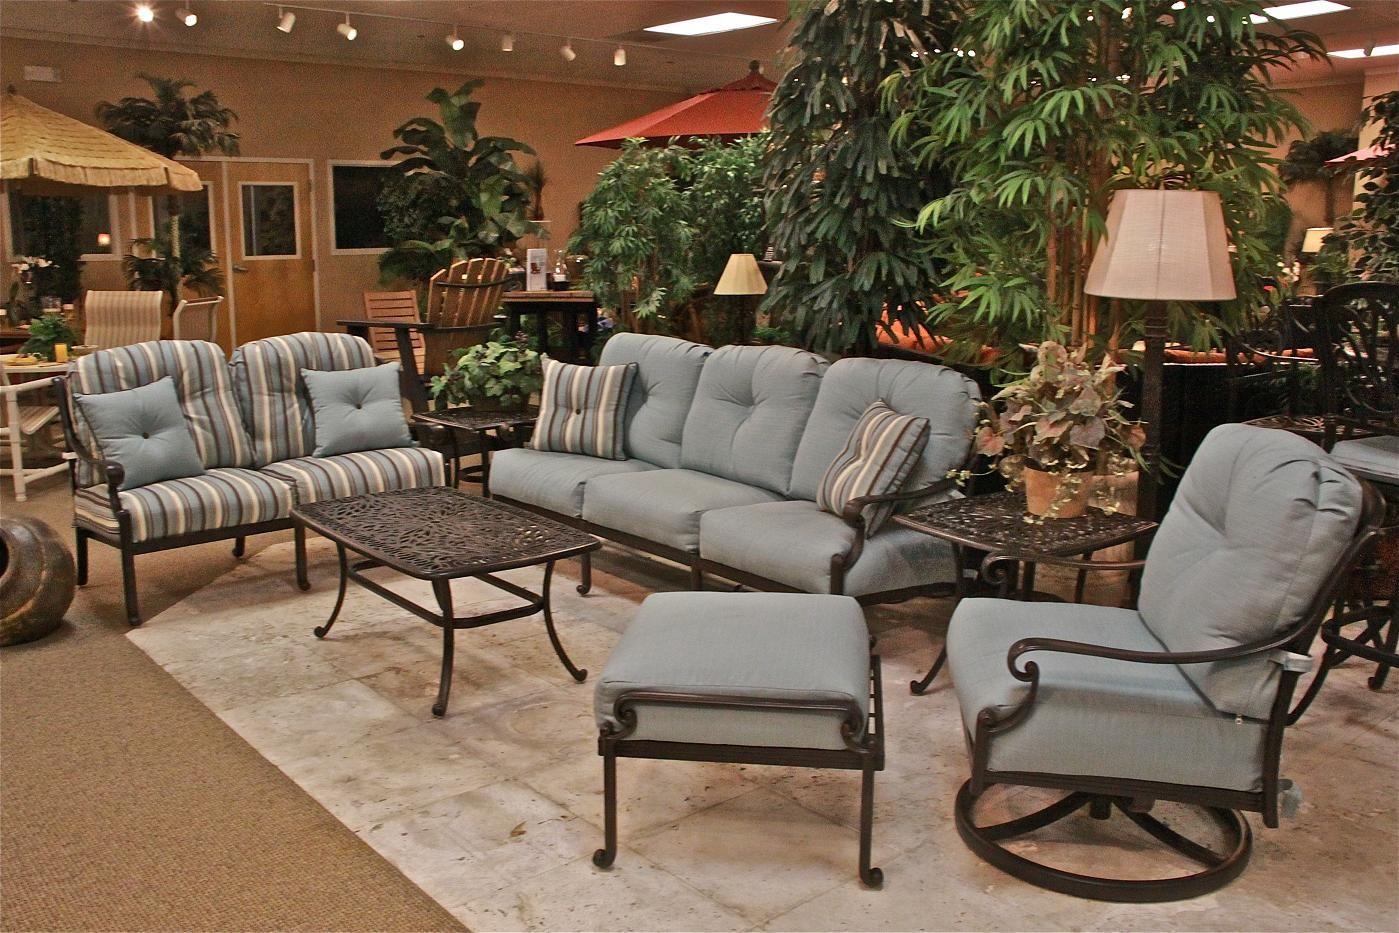 Exceptional Palm Casual  Patio Furniture  Tampa FL   Modern Patio Furniture